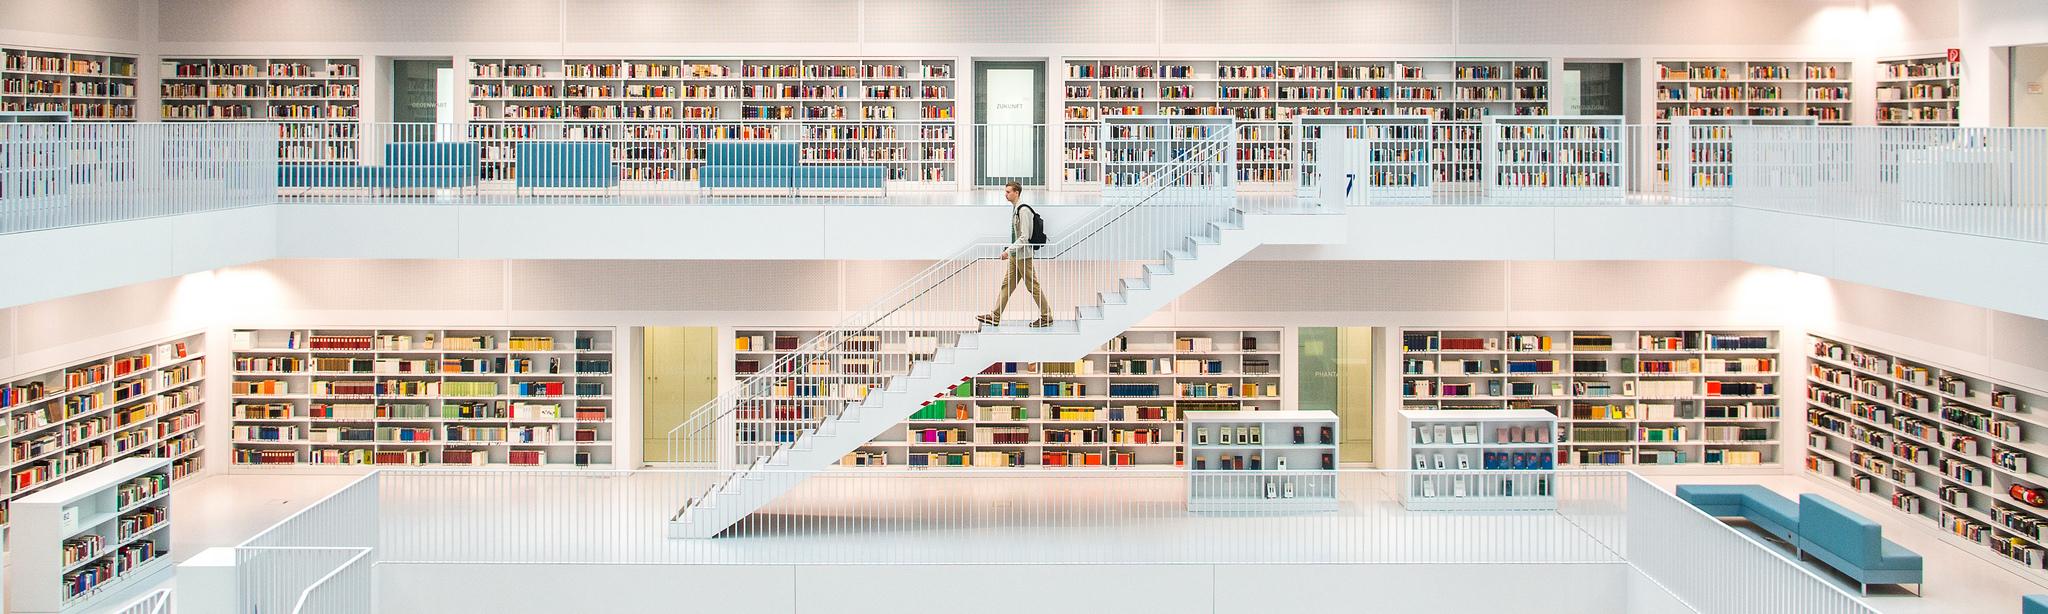 Illustration : une bibliothèque (Thomas Leuthard sur Flickr)